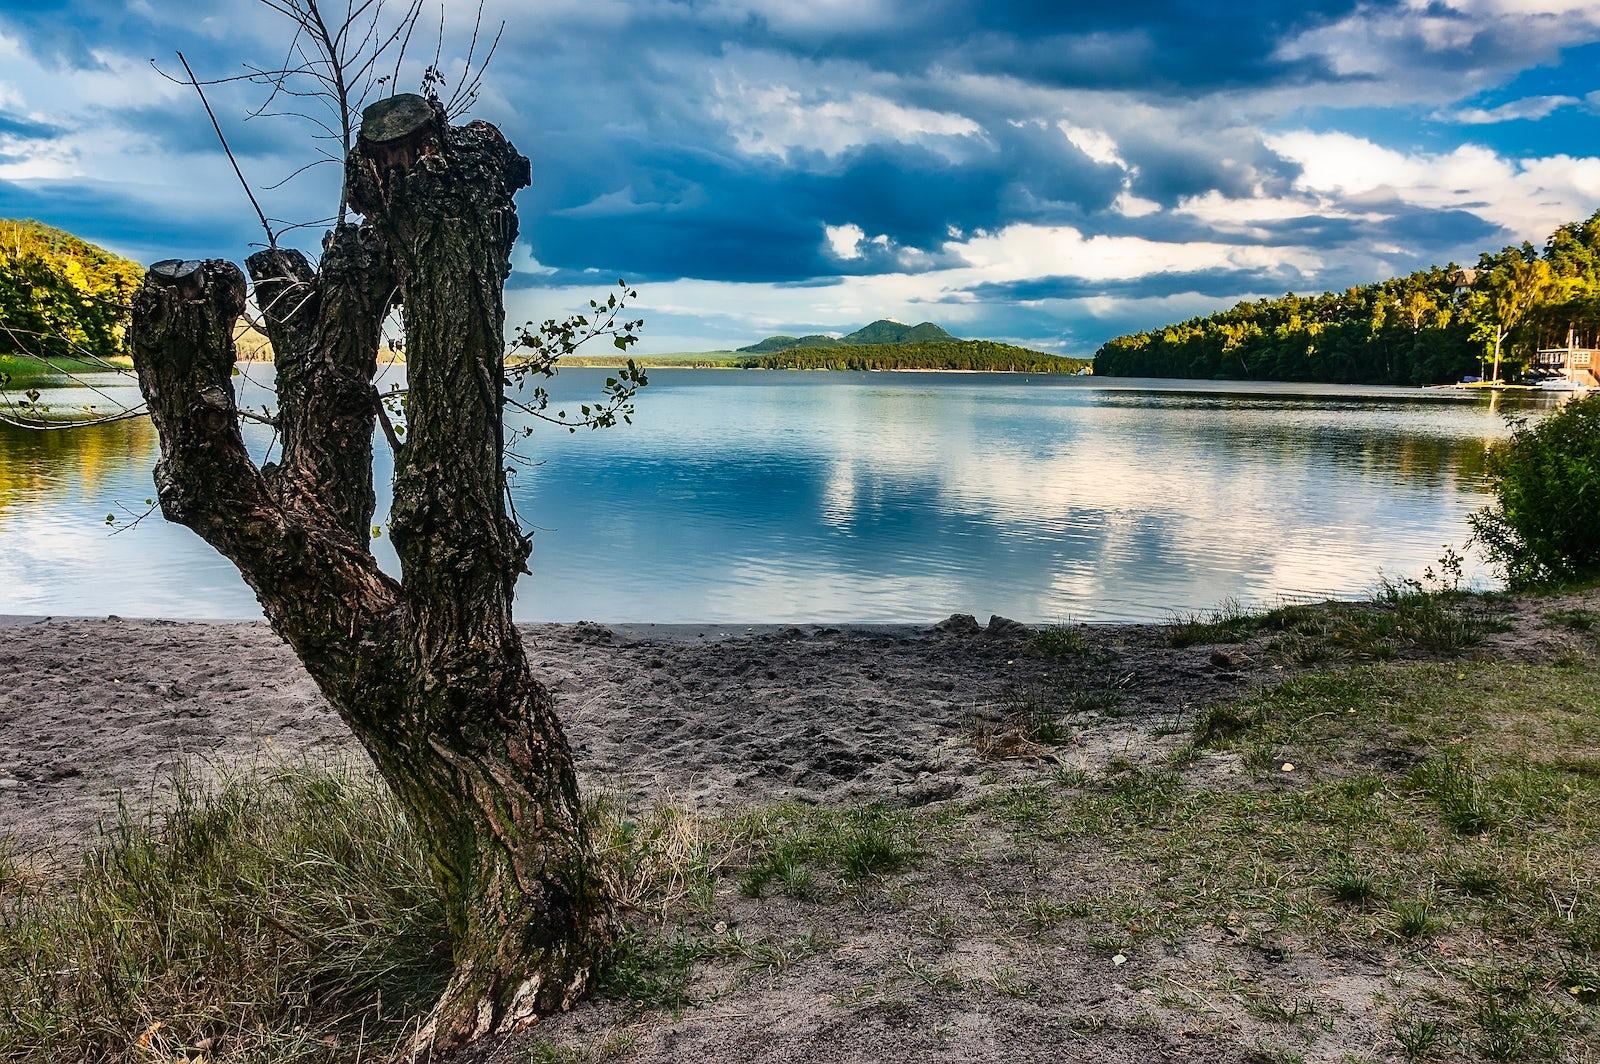 Imagem © Créditos a istock/Myslitel